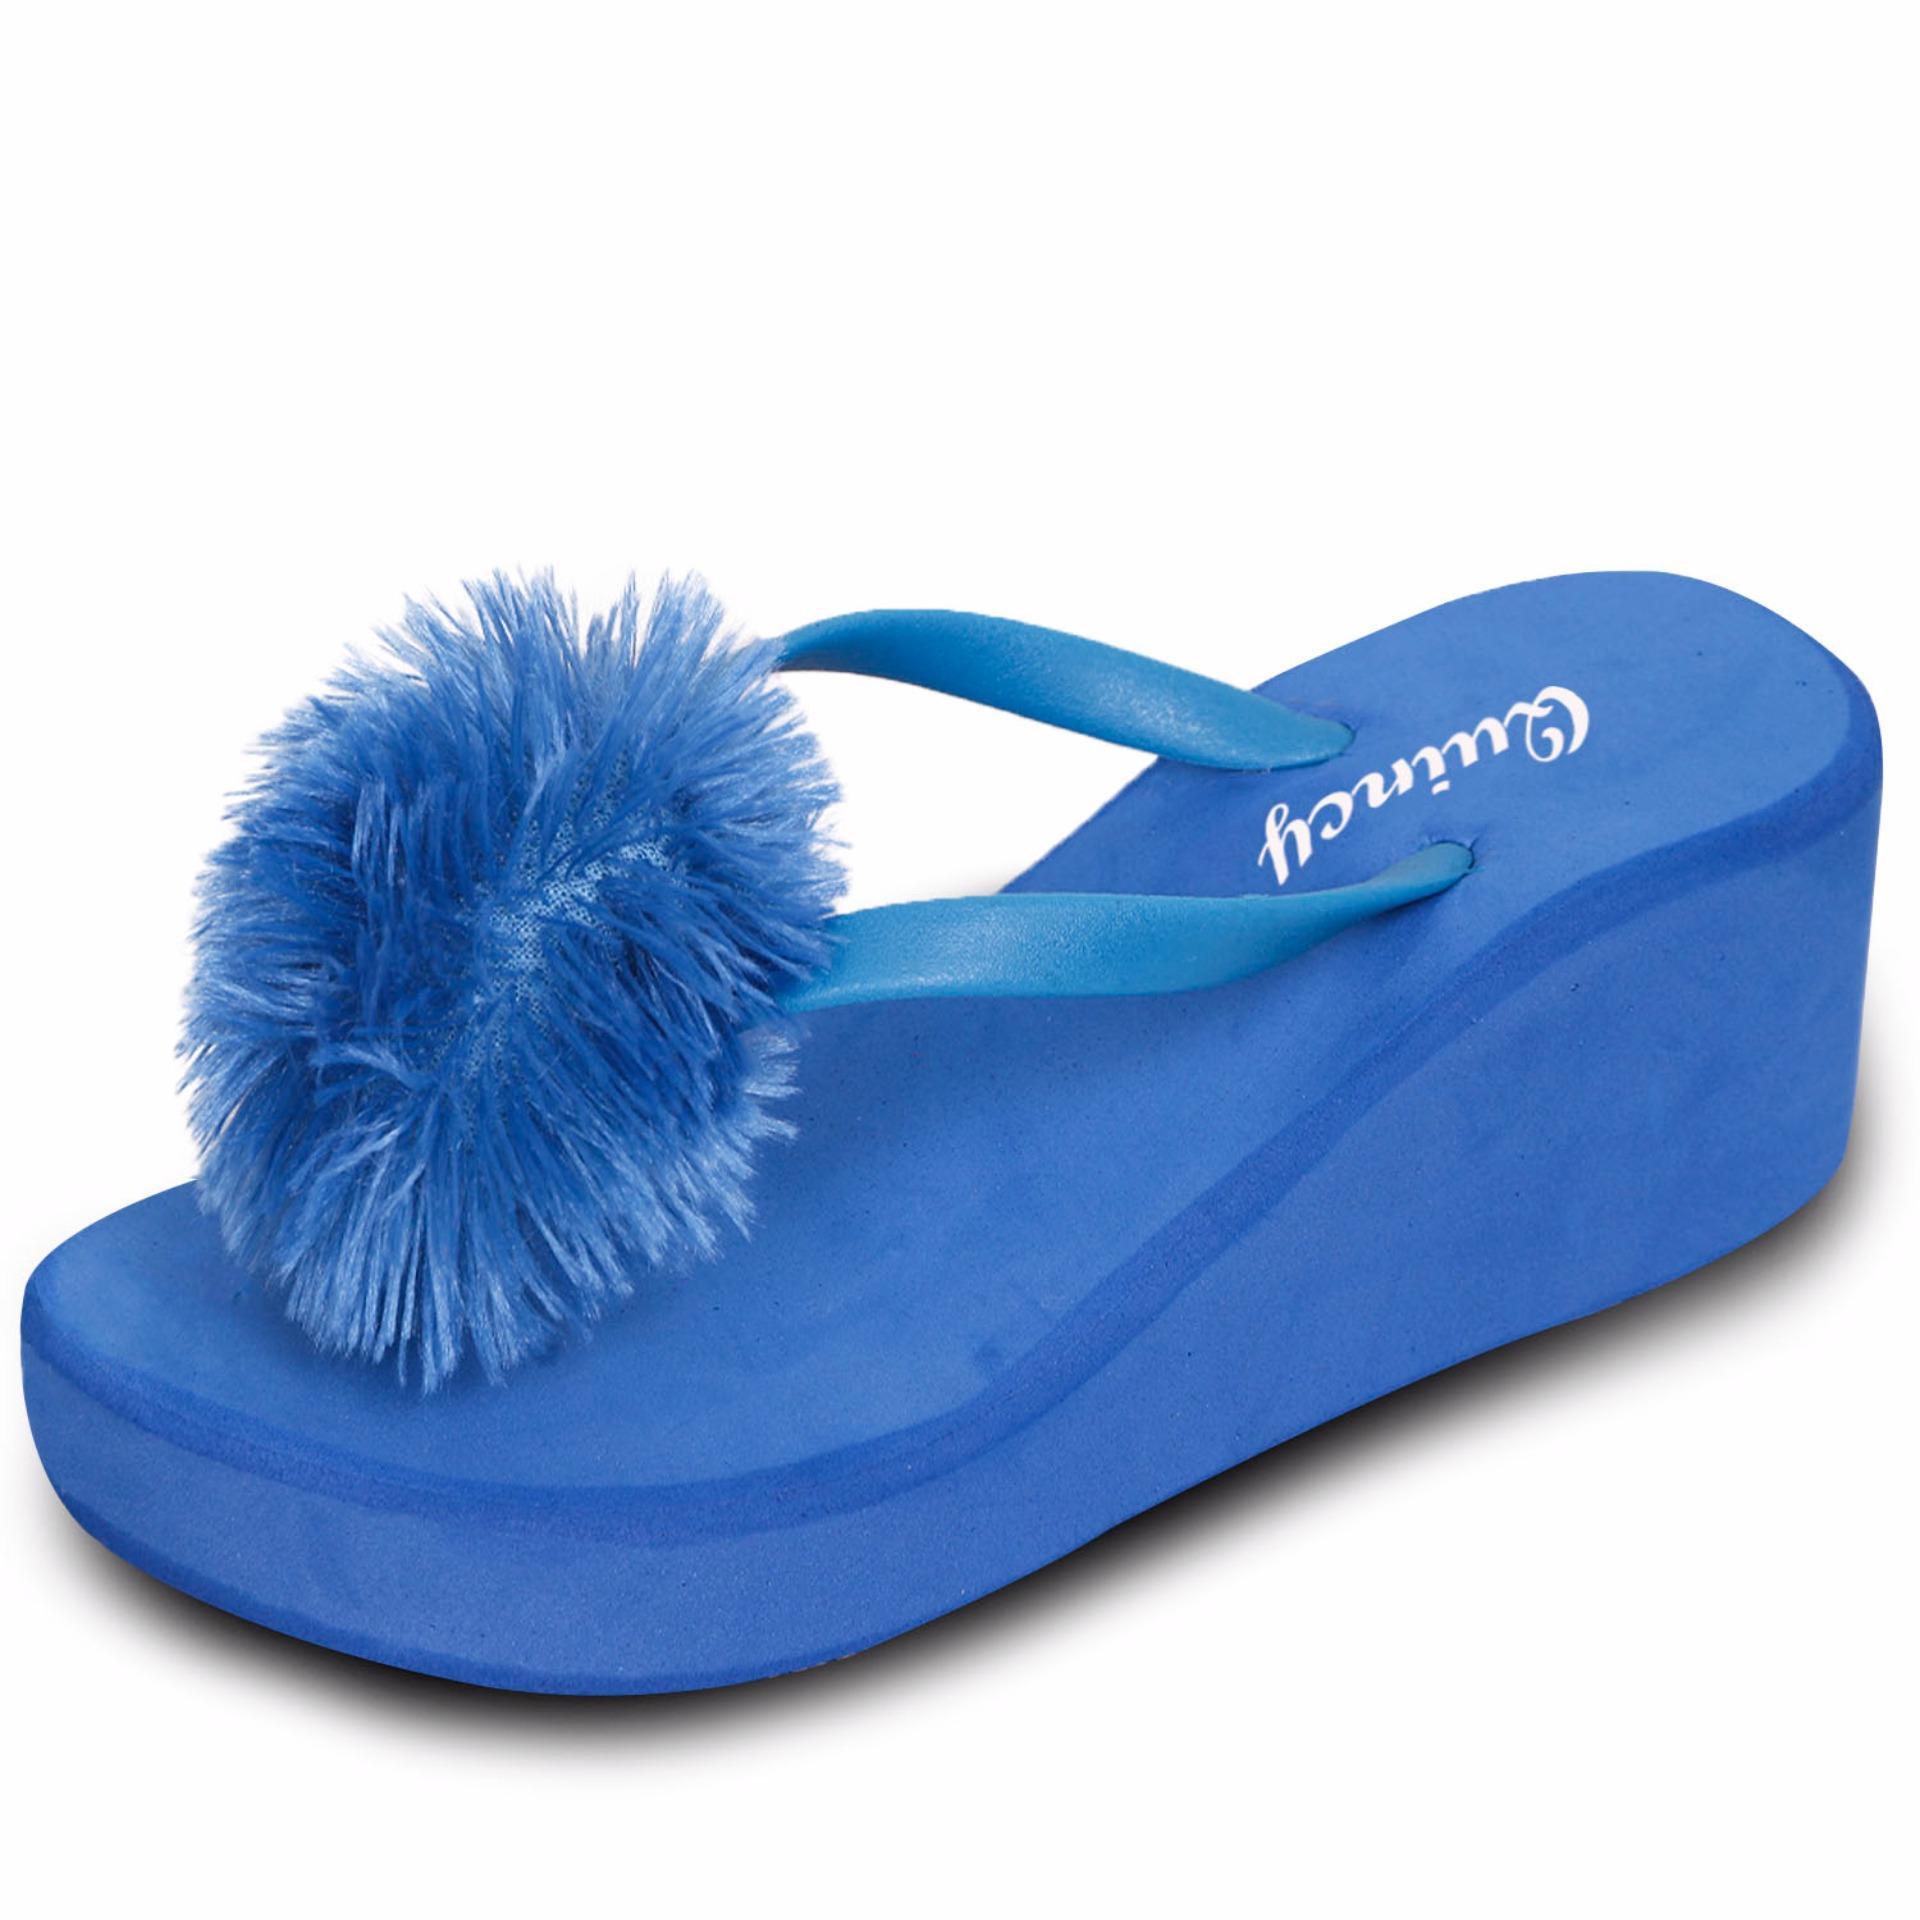 Harga Quincy Sandal Jepit Wedges Briana Blue Yg Bagus